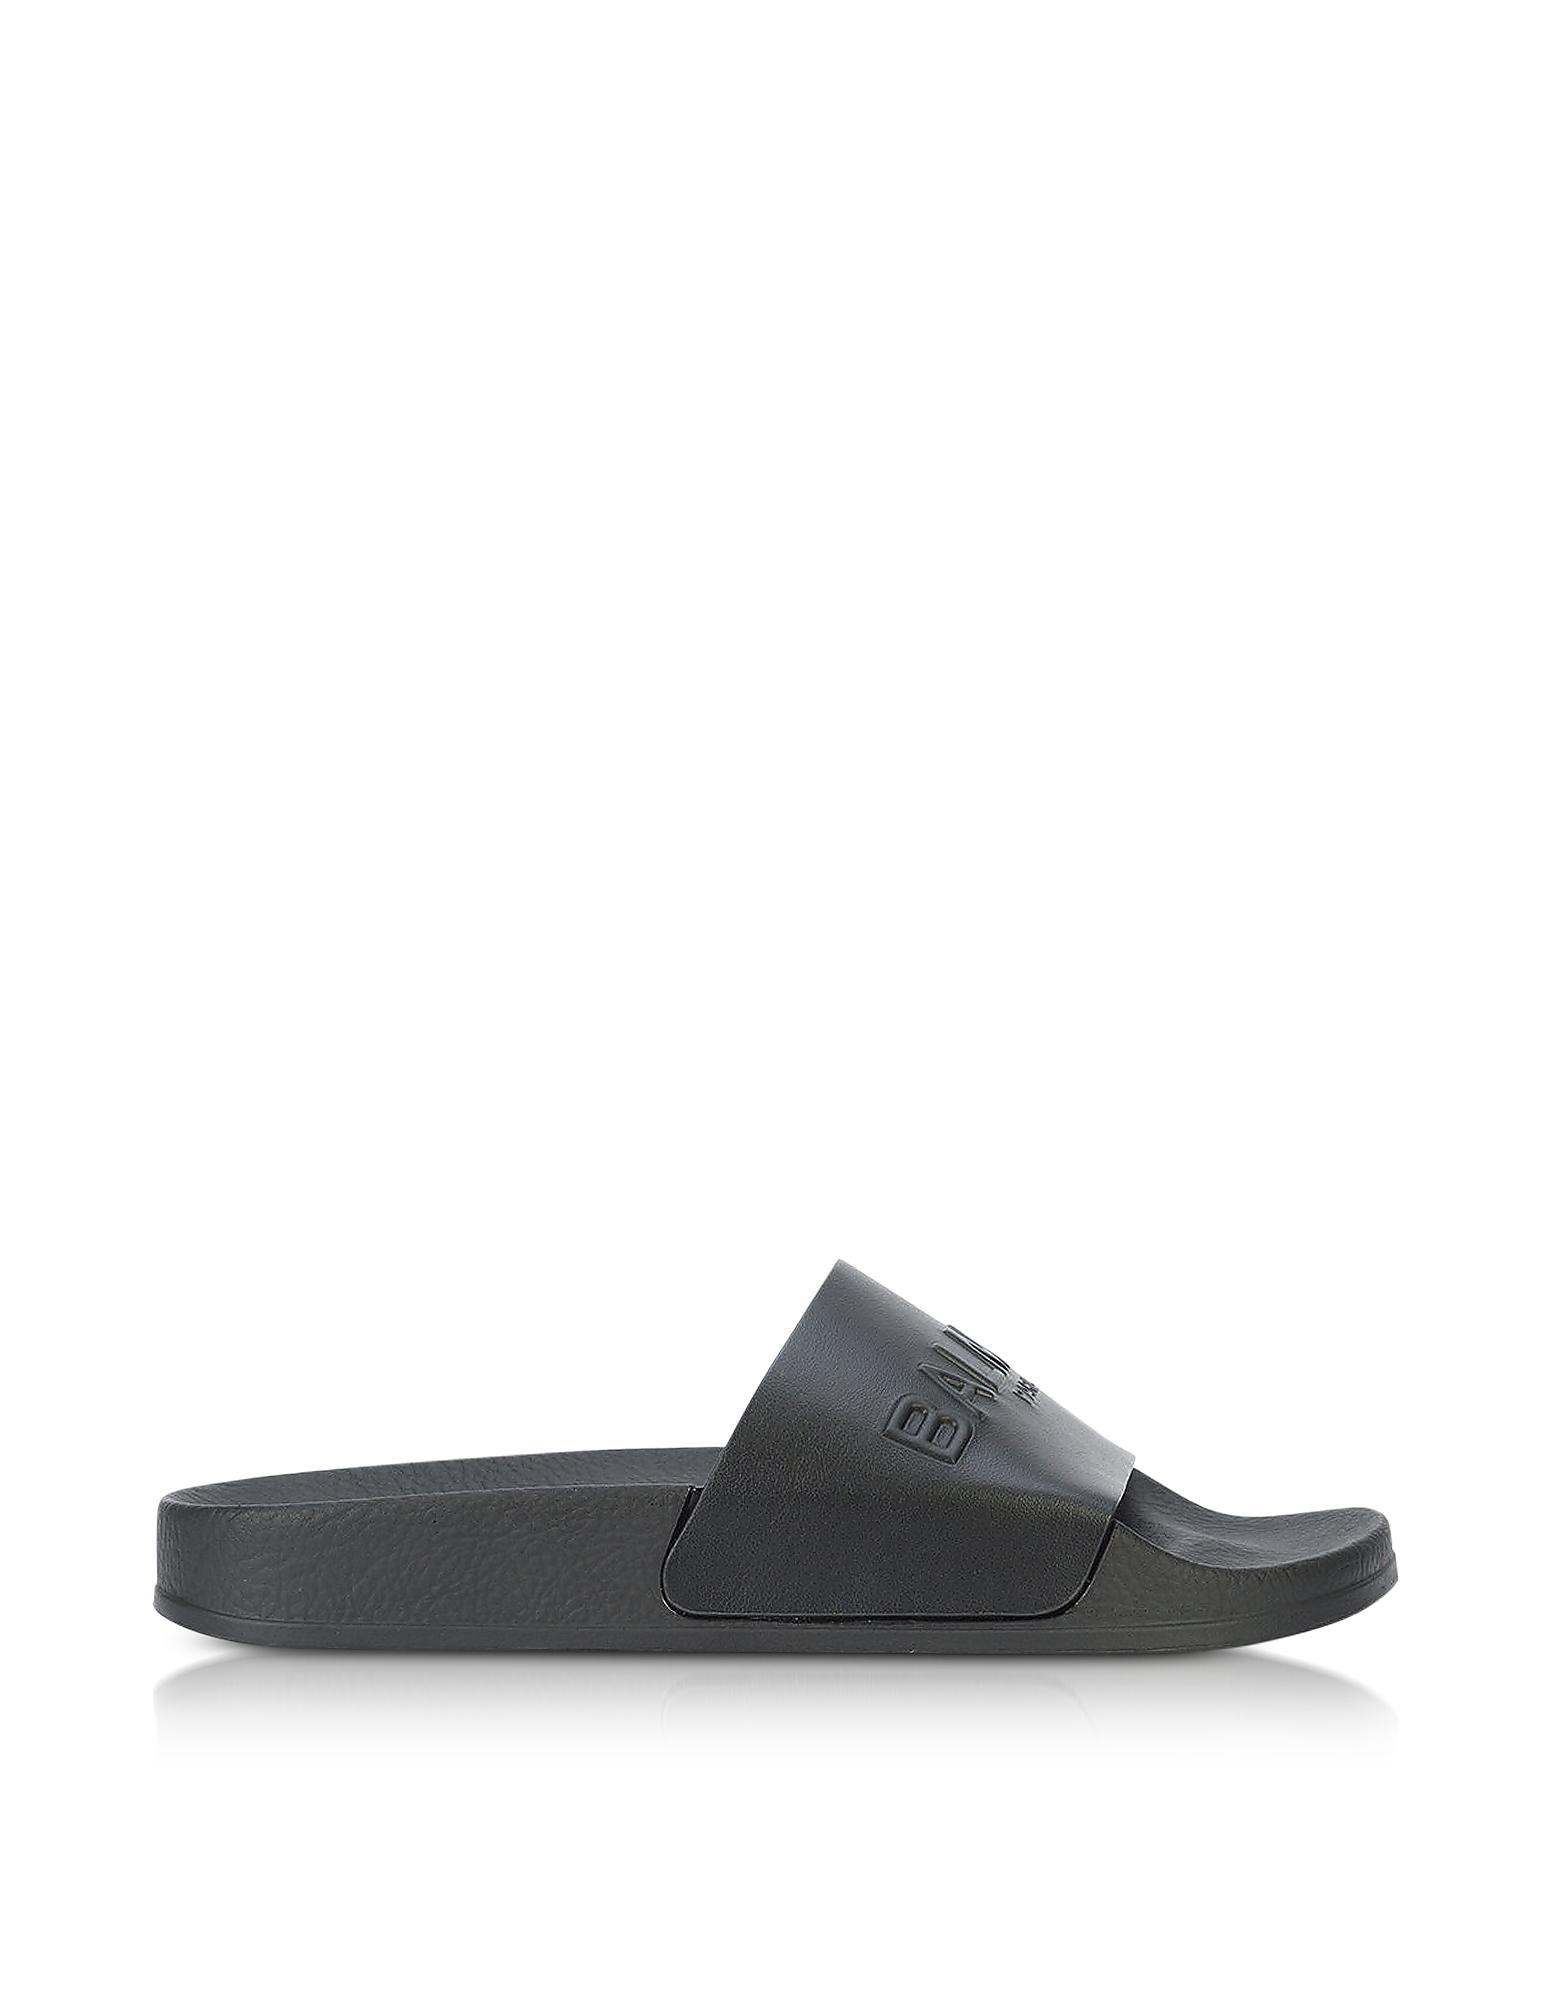 Balmain Shoes, Black Leather Calypso Women's Slide Sandals